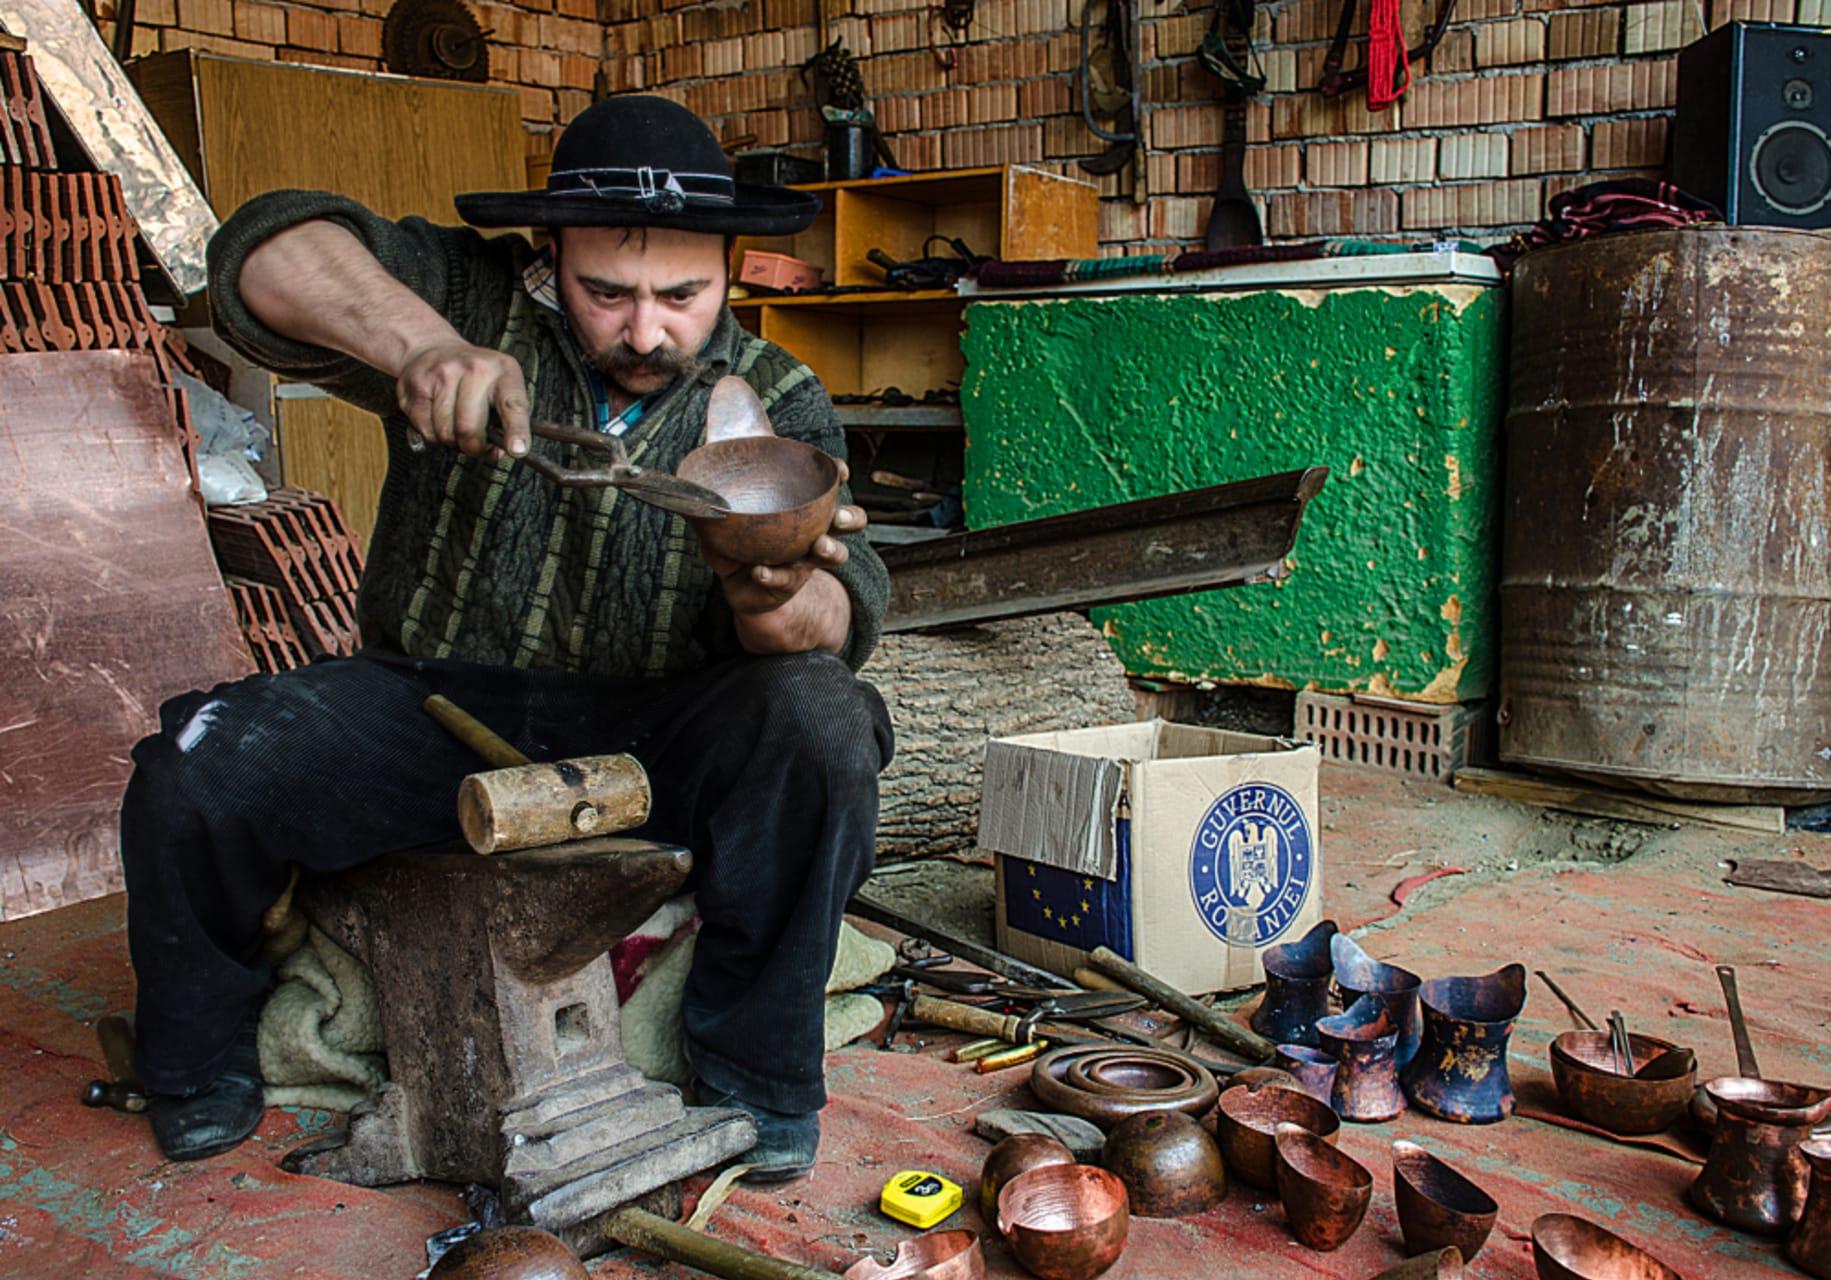 Transylvania - A Coppersmith within a Roma family in a small village of Transylvania